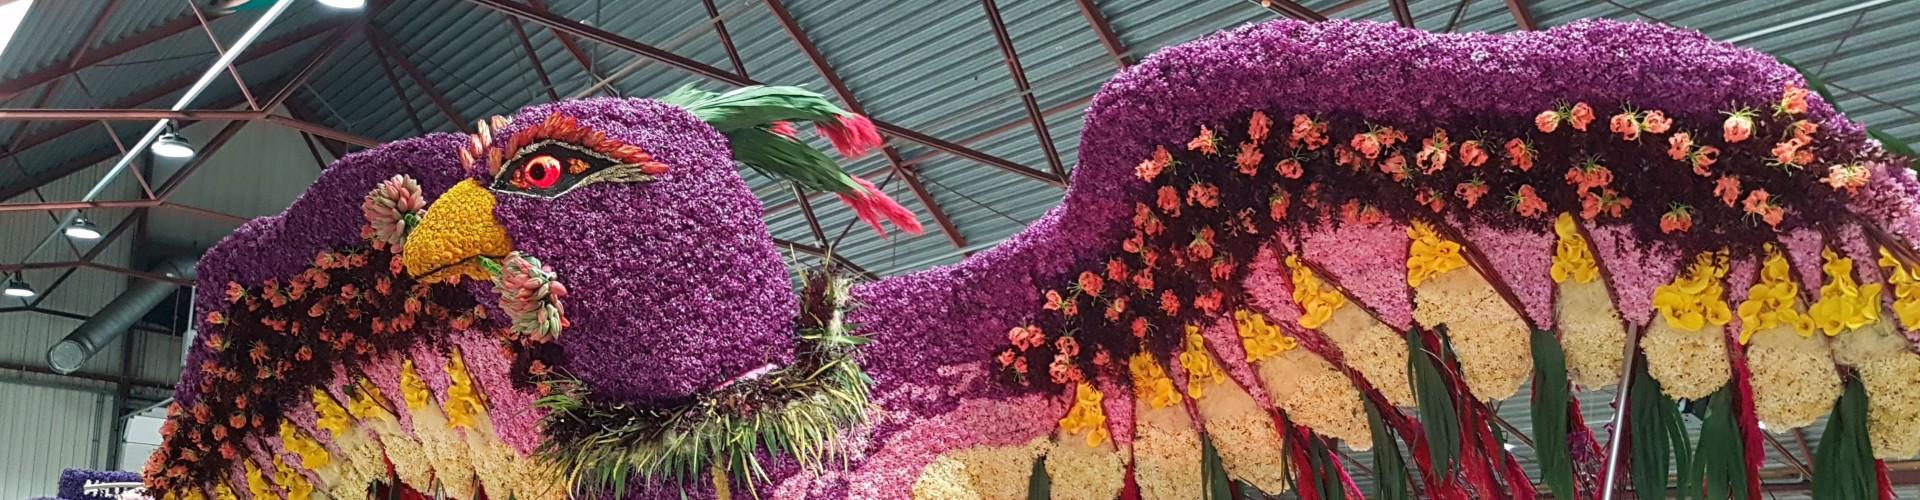 Bird on float created with bulb flowers